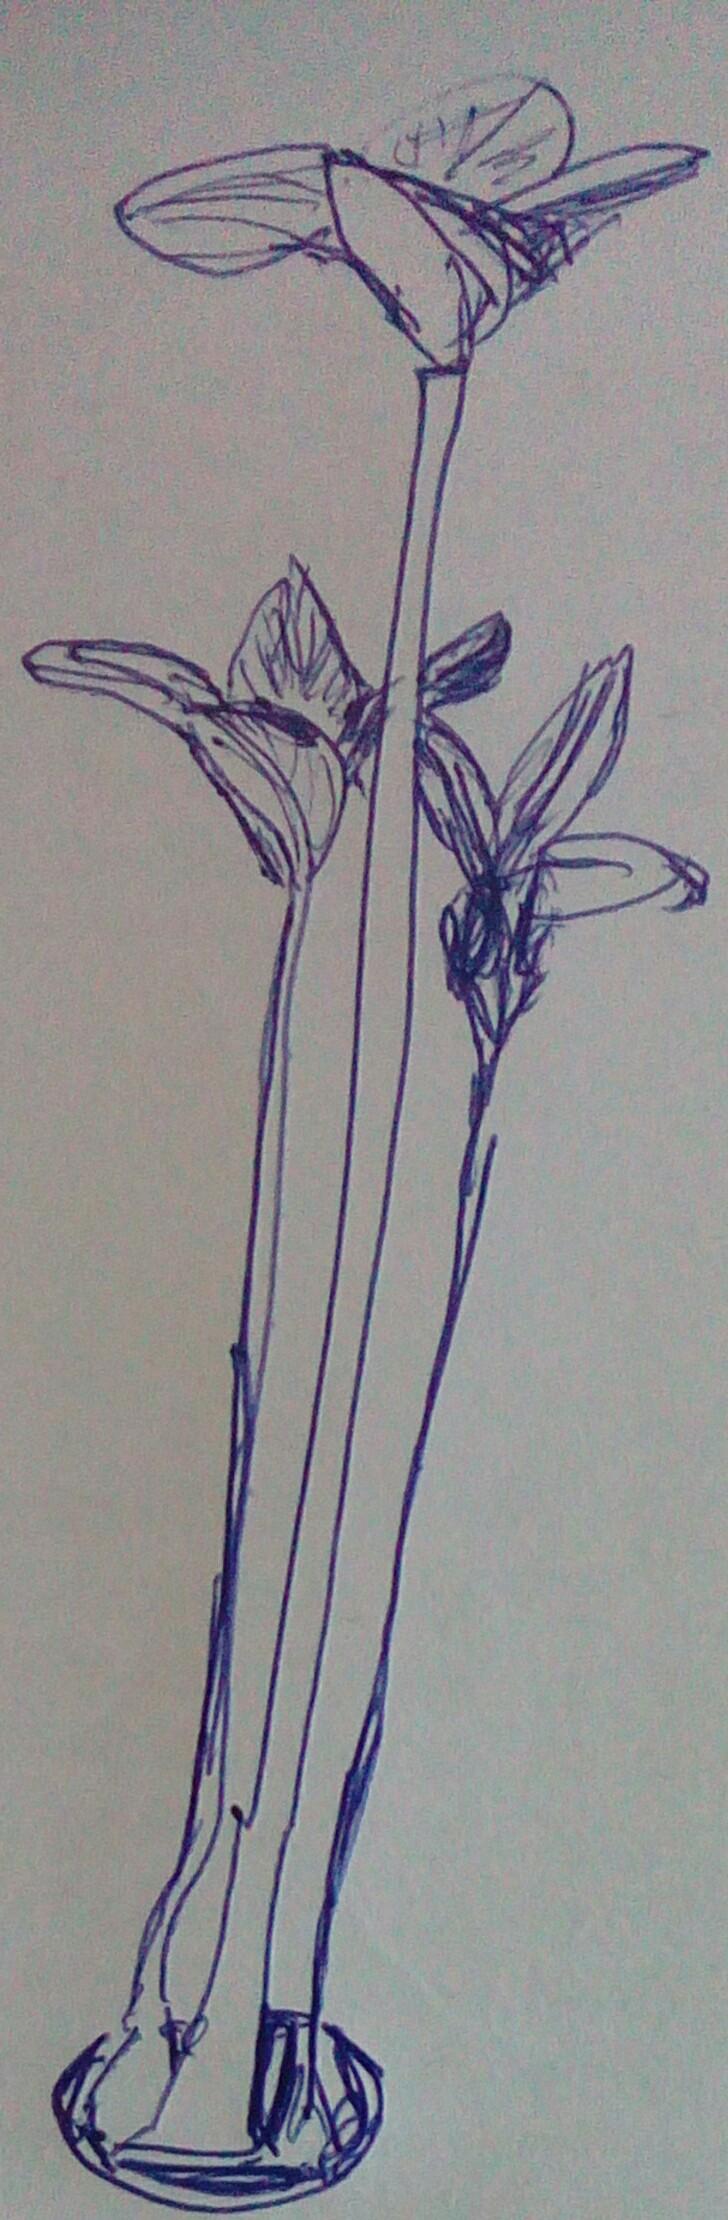 Drawing Plants by JimWolfdog